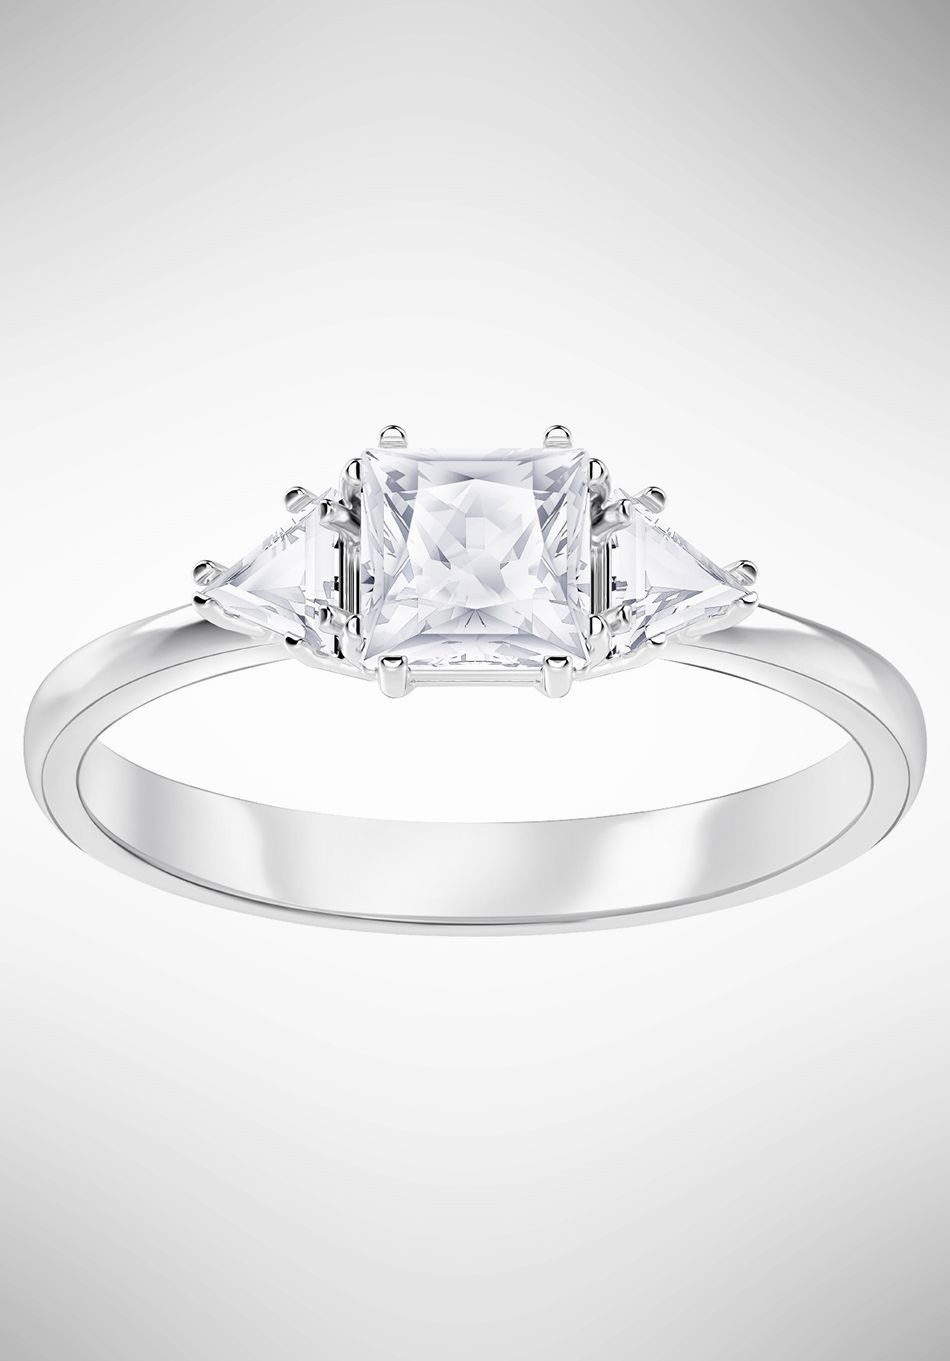 a59da98d0 Swarovski Attract Trilogy Ring, White, Rhodium plating 5402447 ...